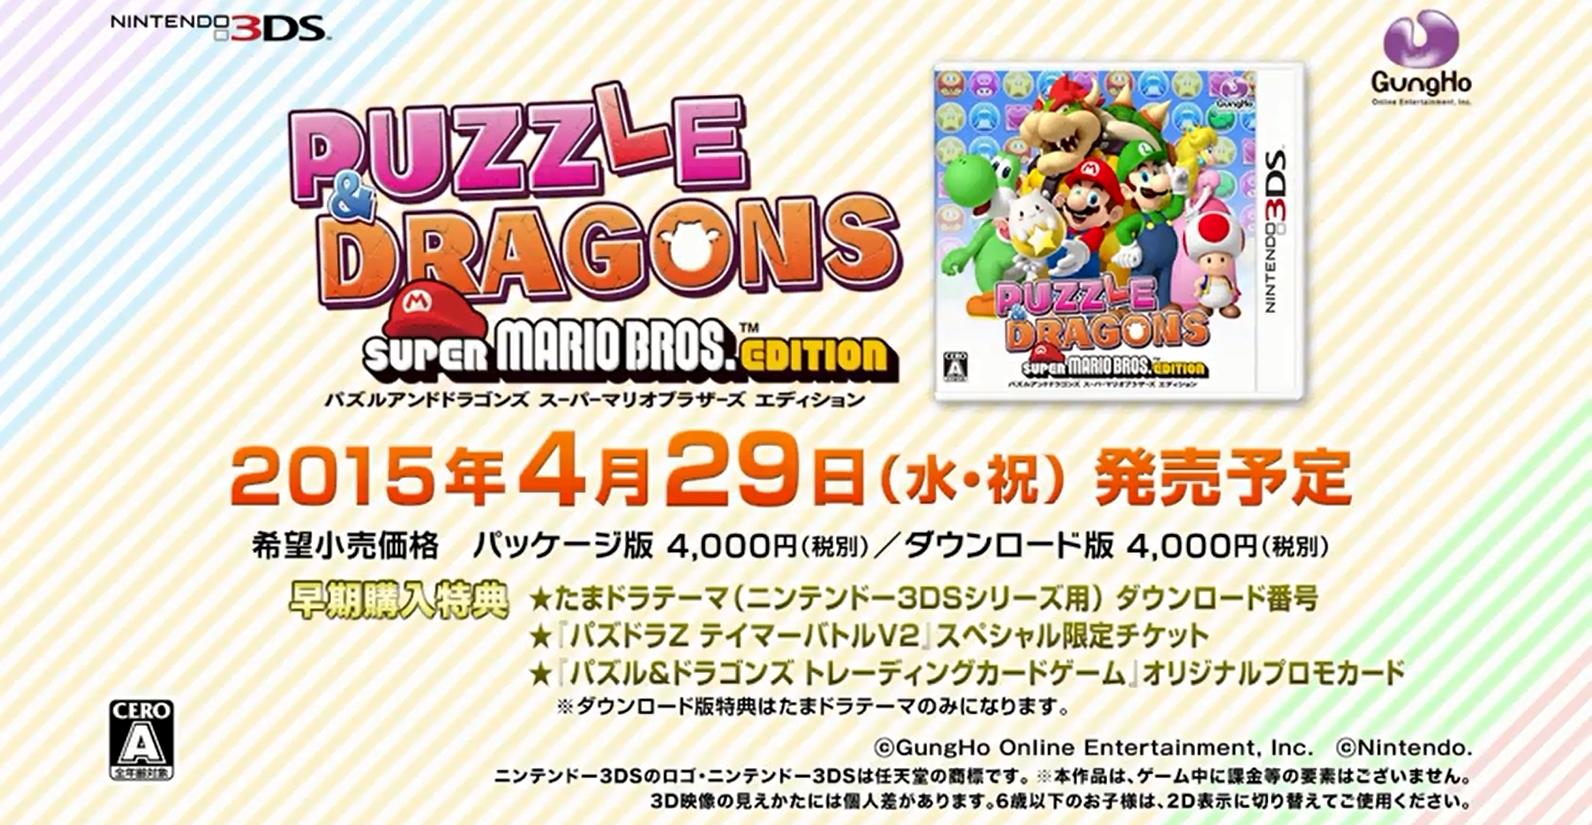 puzzle-and-dragons-mario-card-20150108-2.jpg